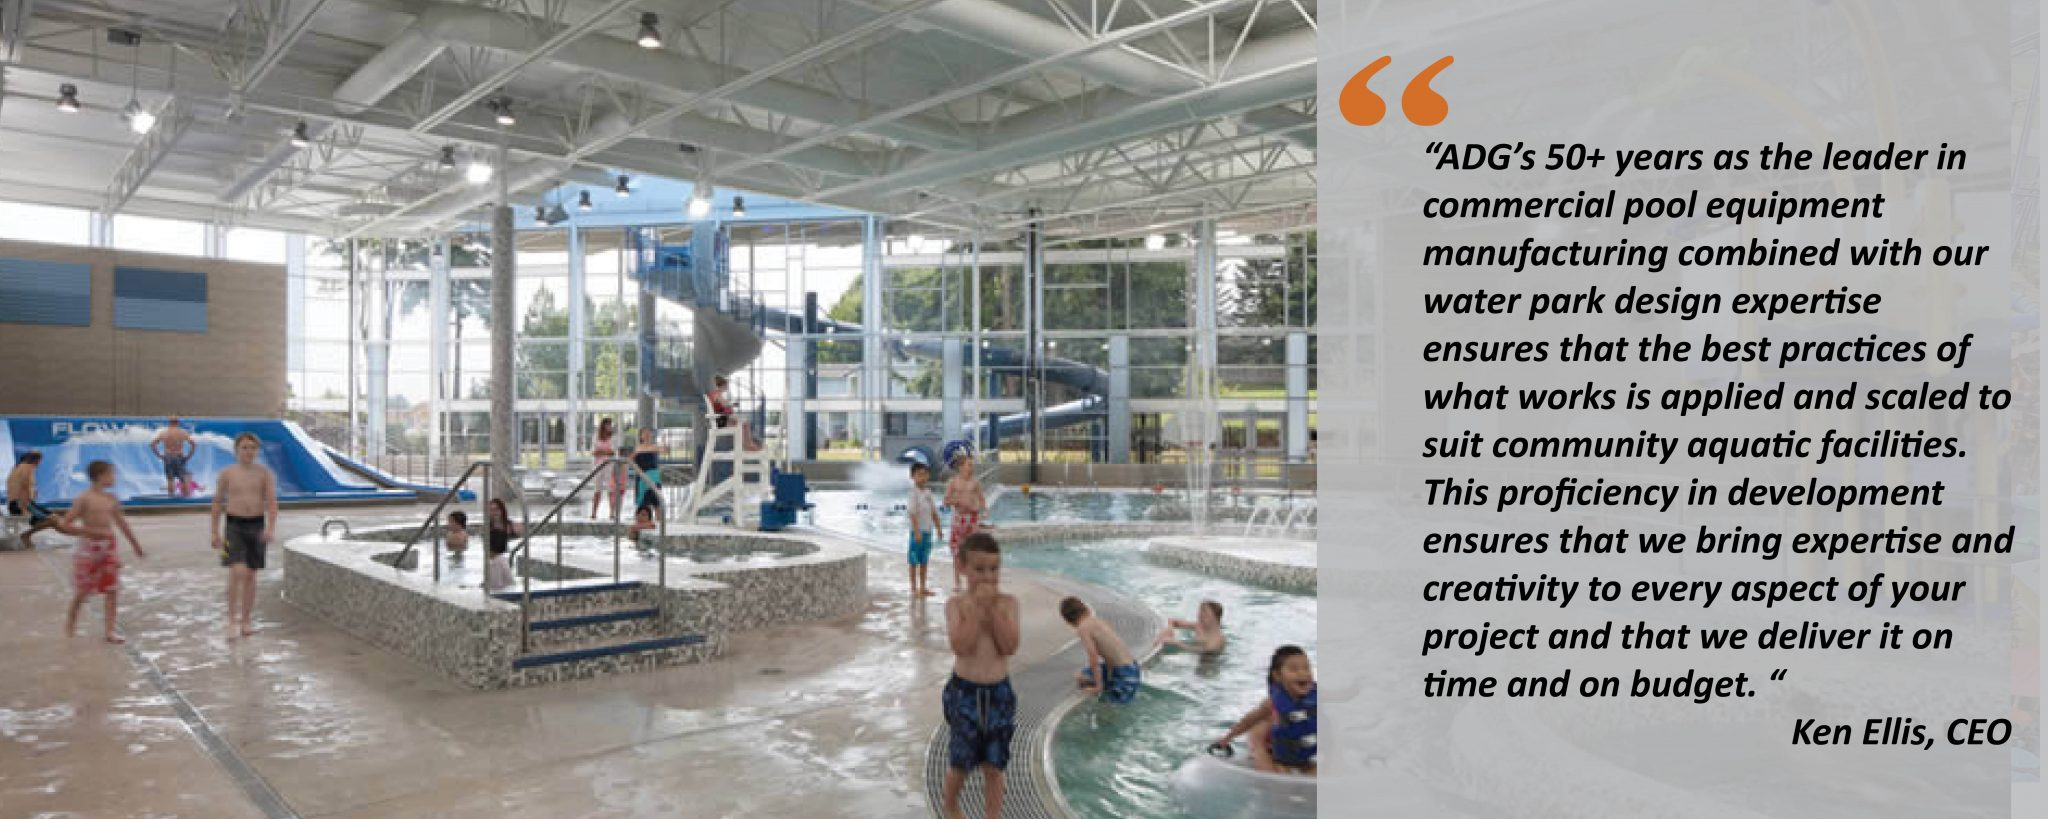 aquatic center water park